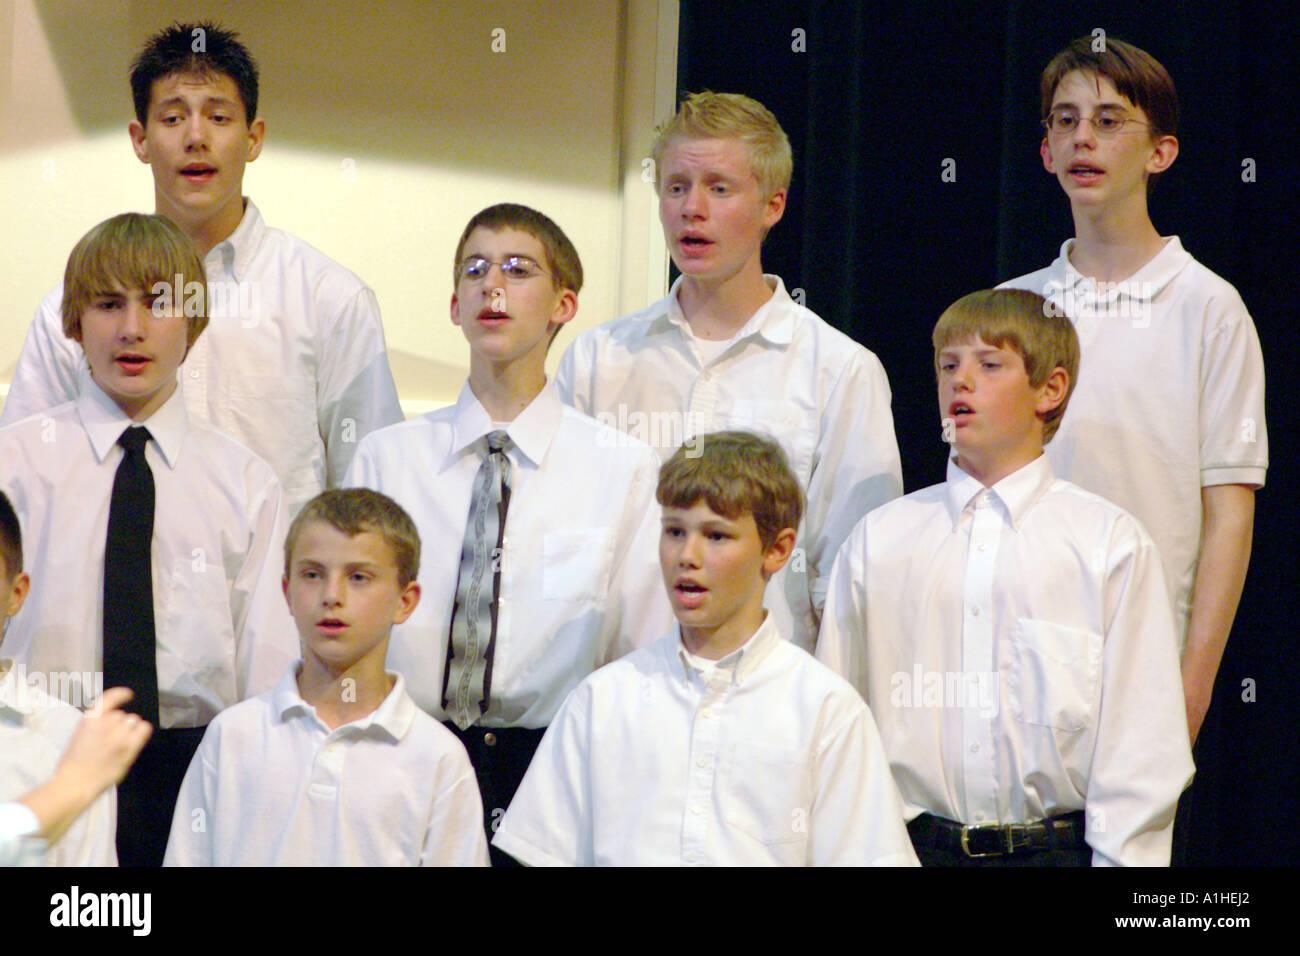 school choir boys performing - Stock Image